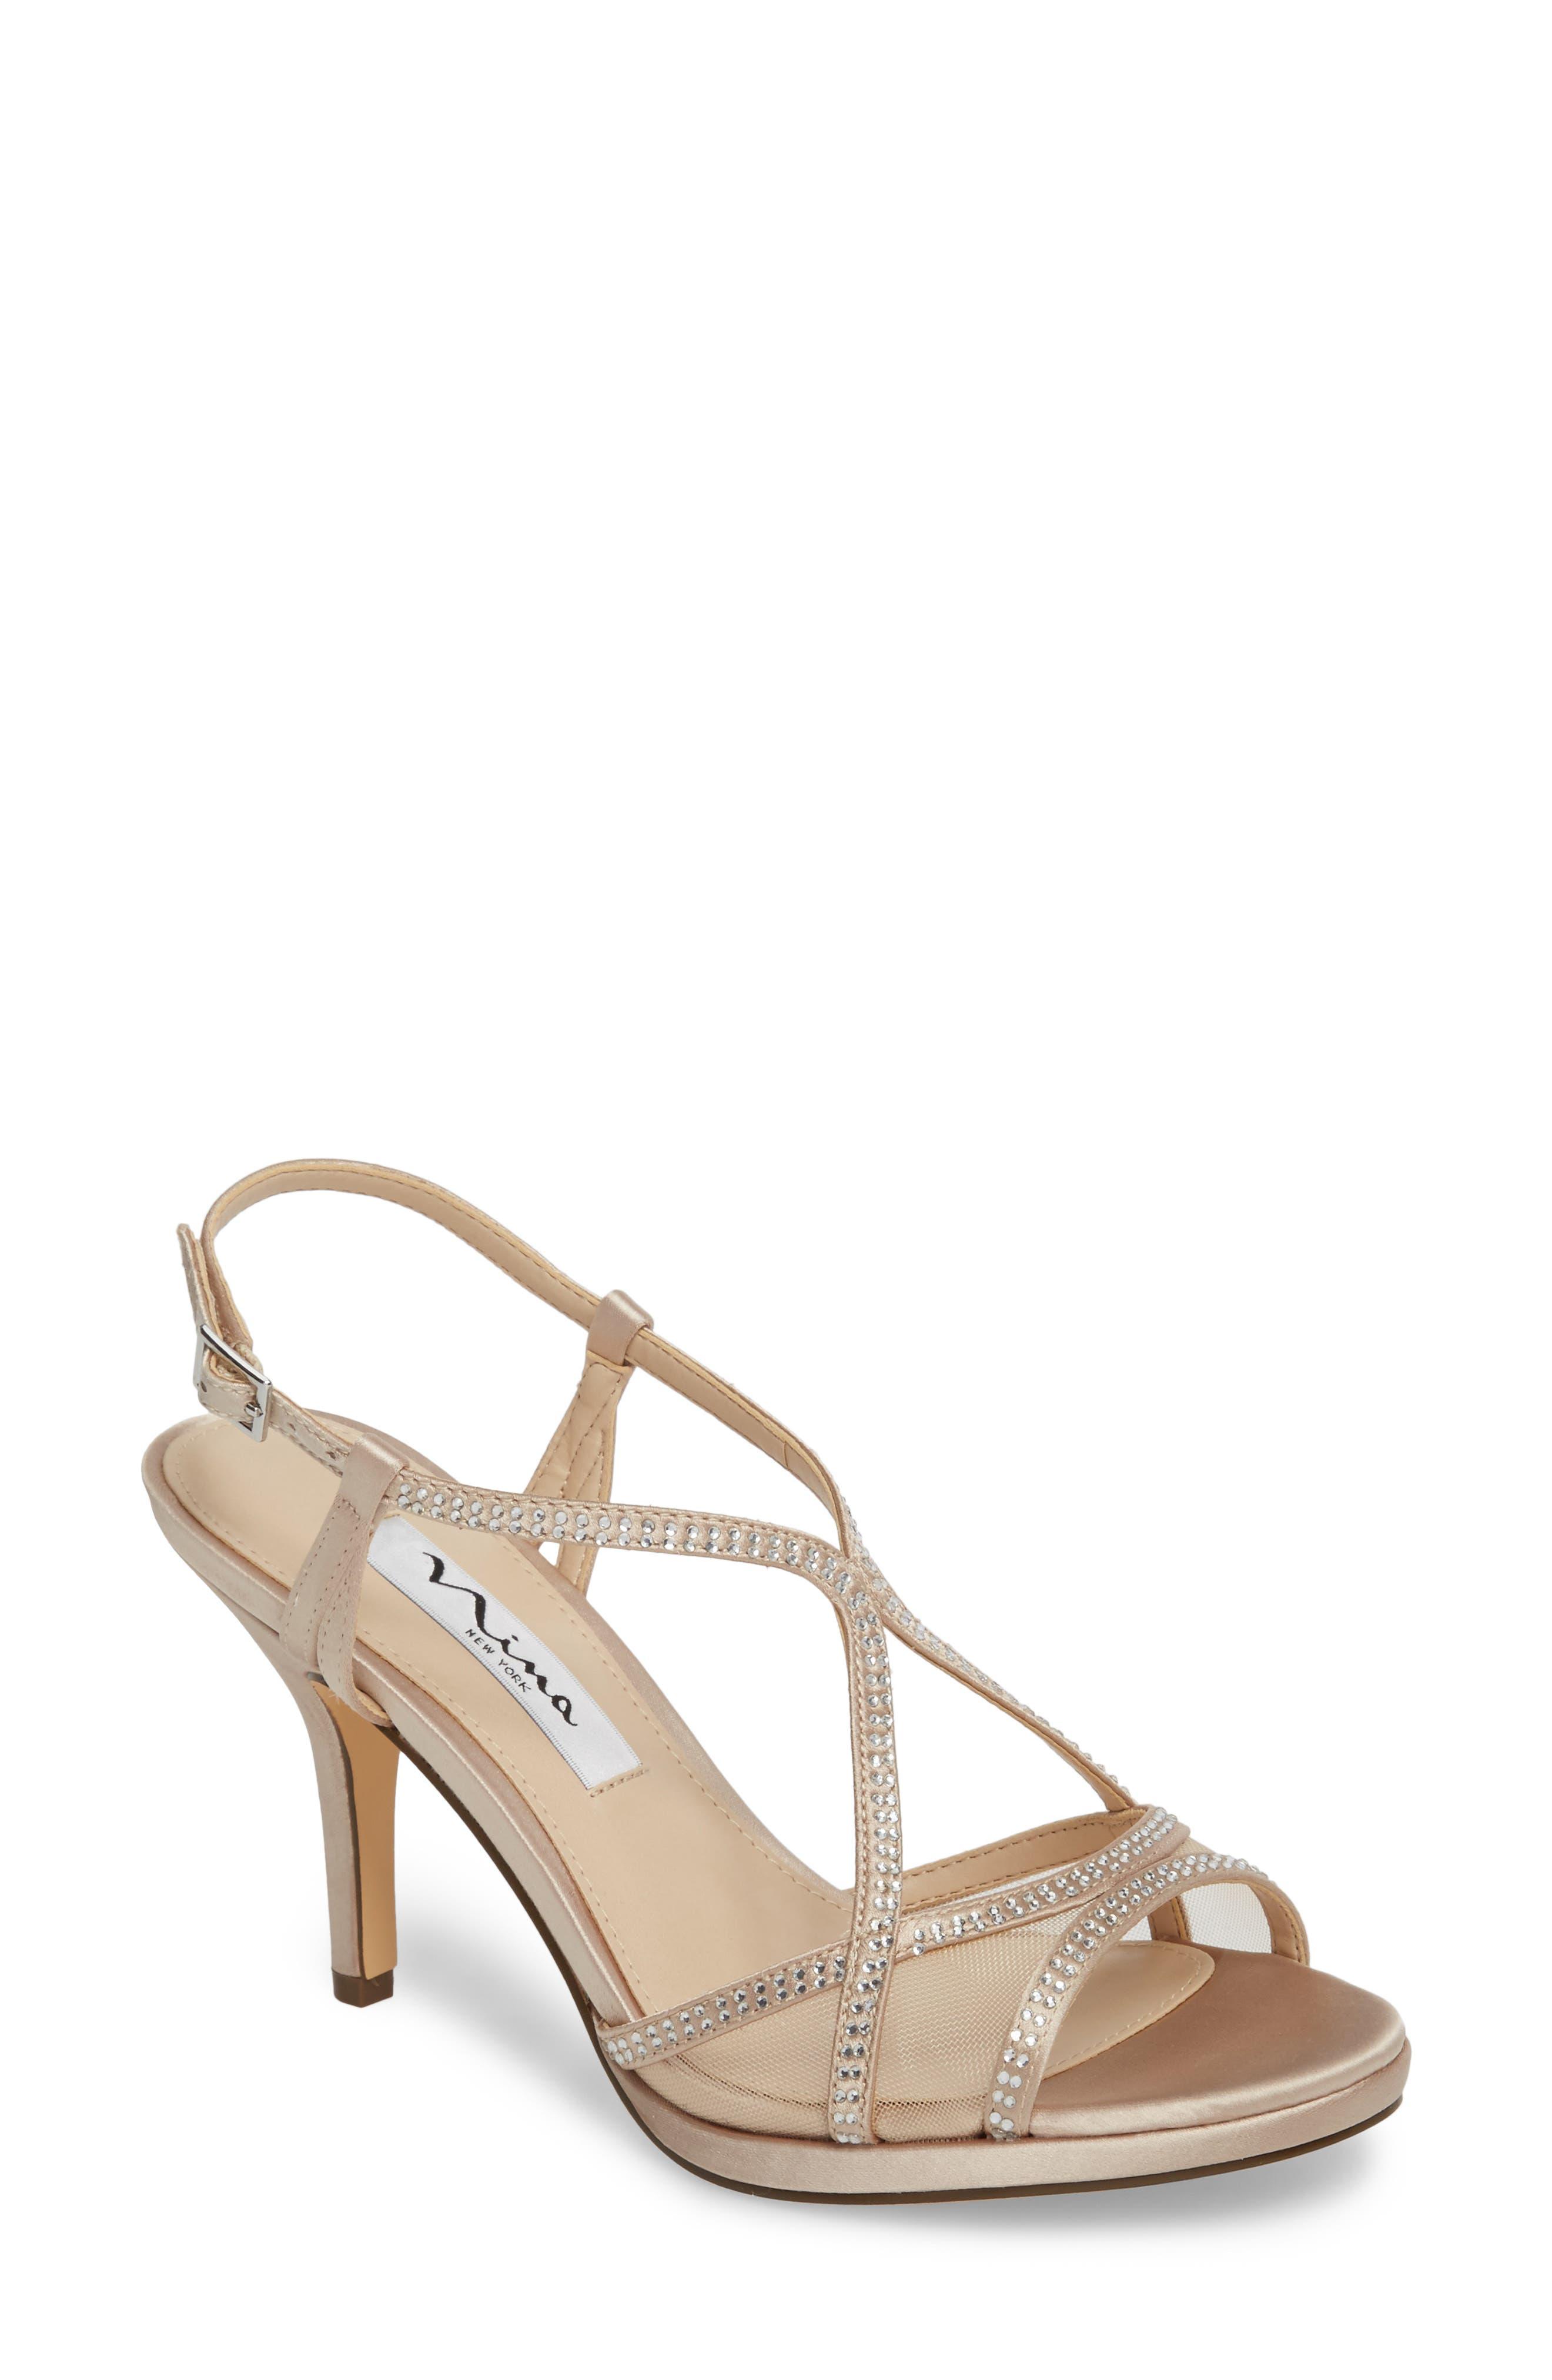 Main Image - Nina Blossom Crystal Embellished Sandal (Women)